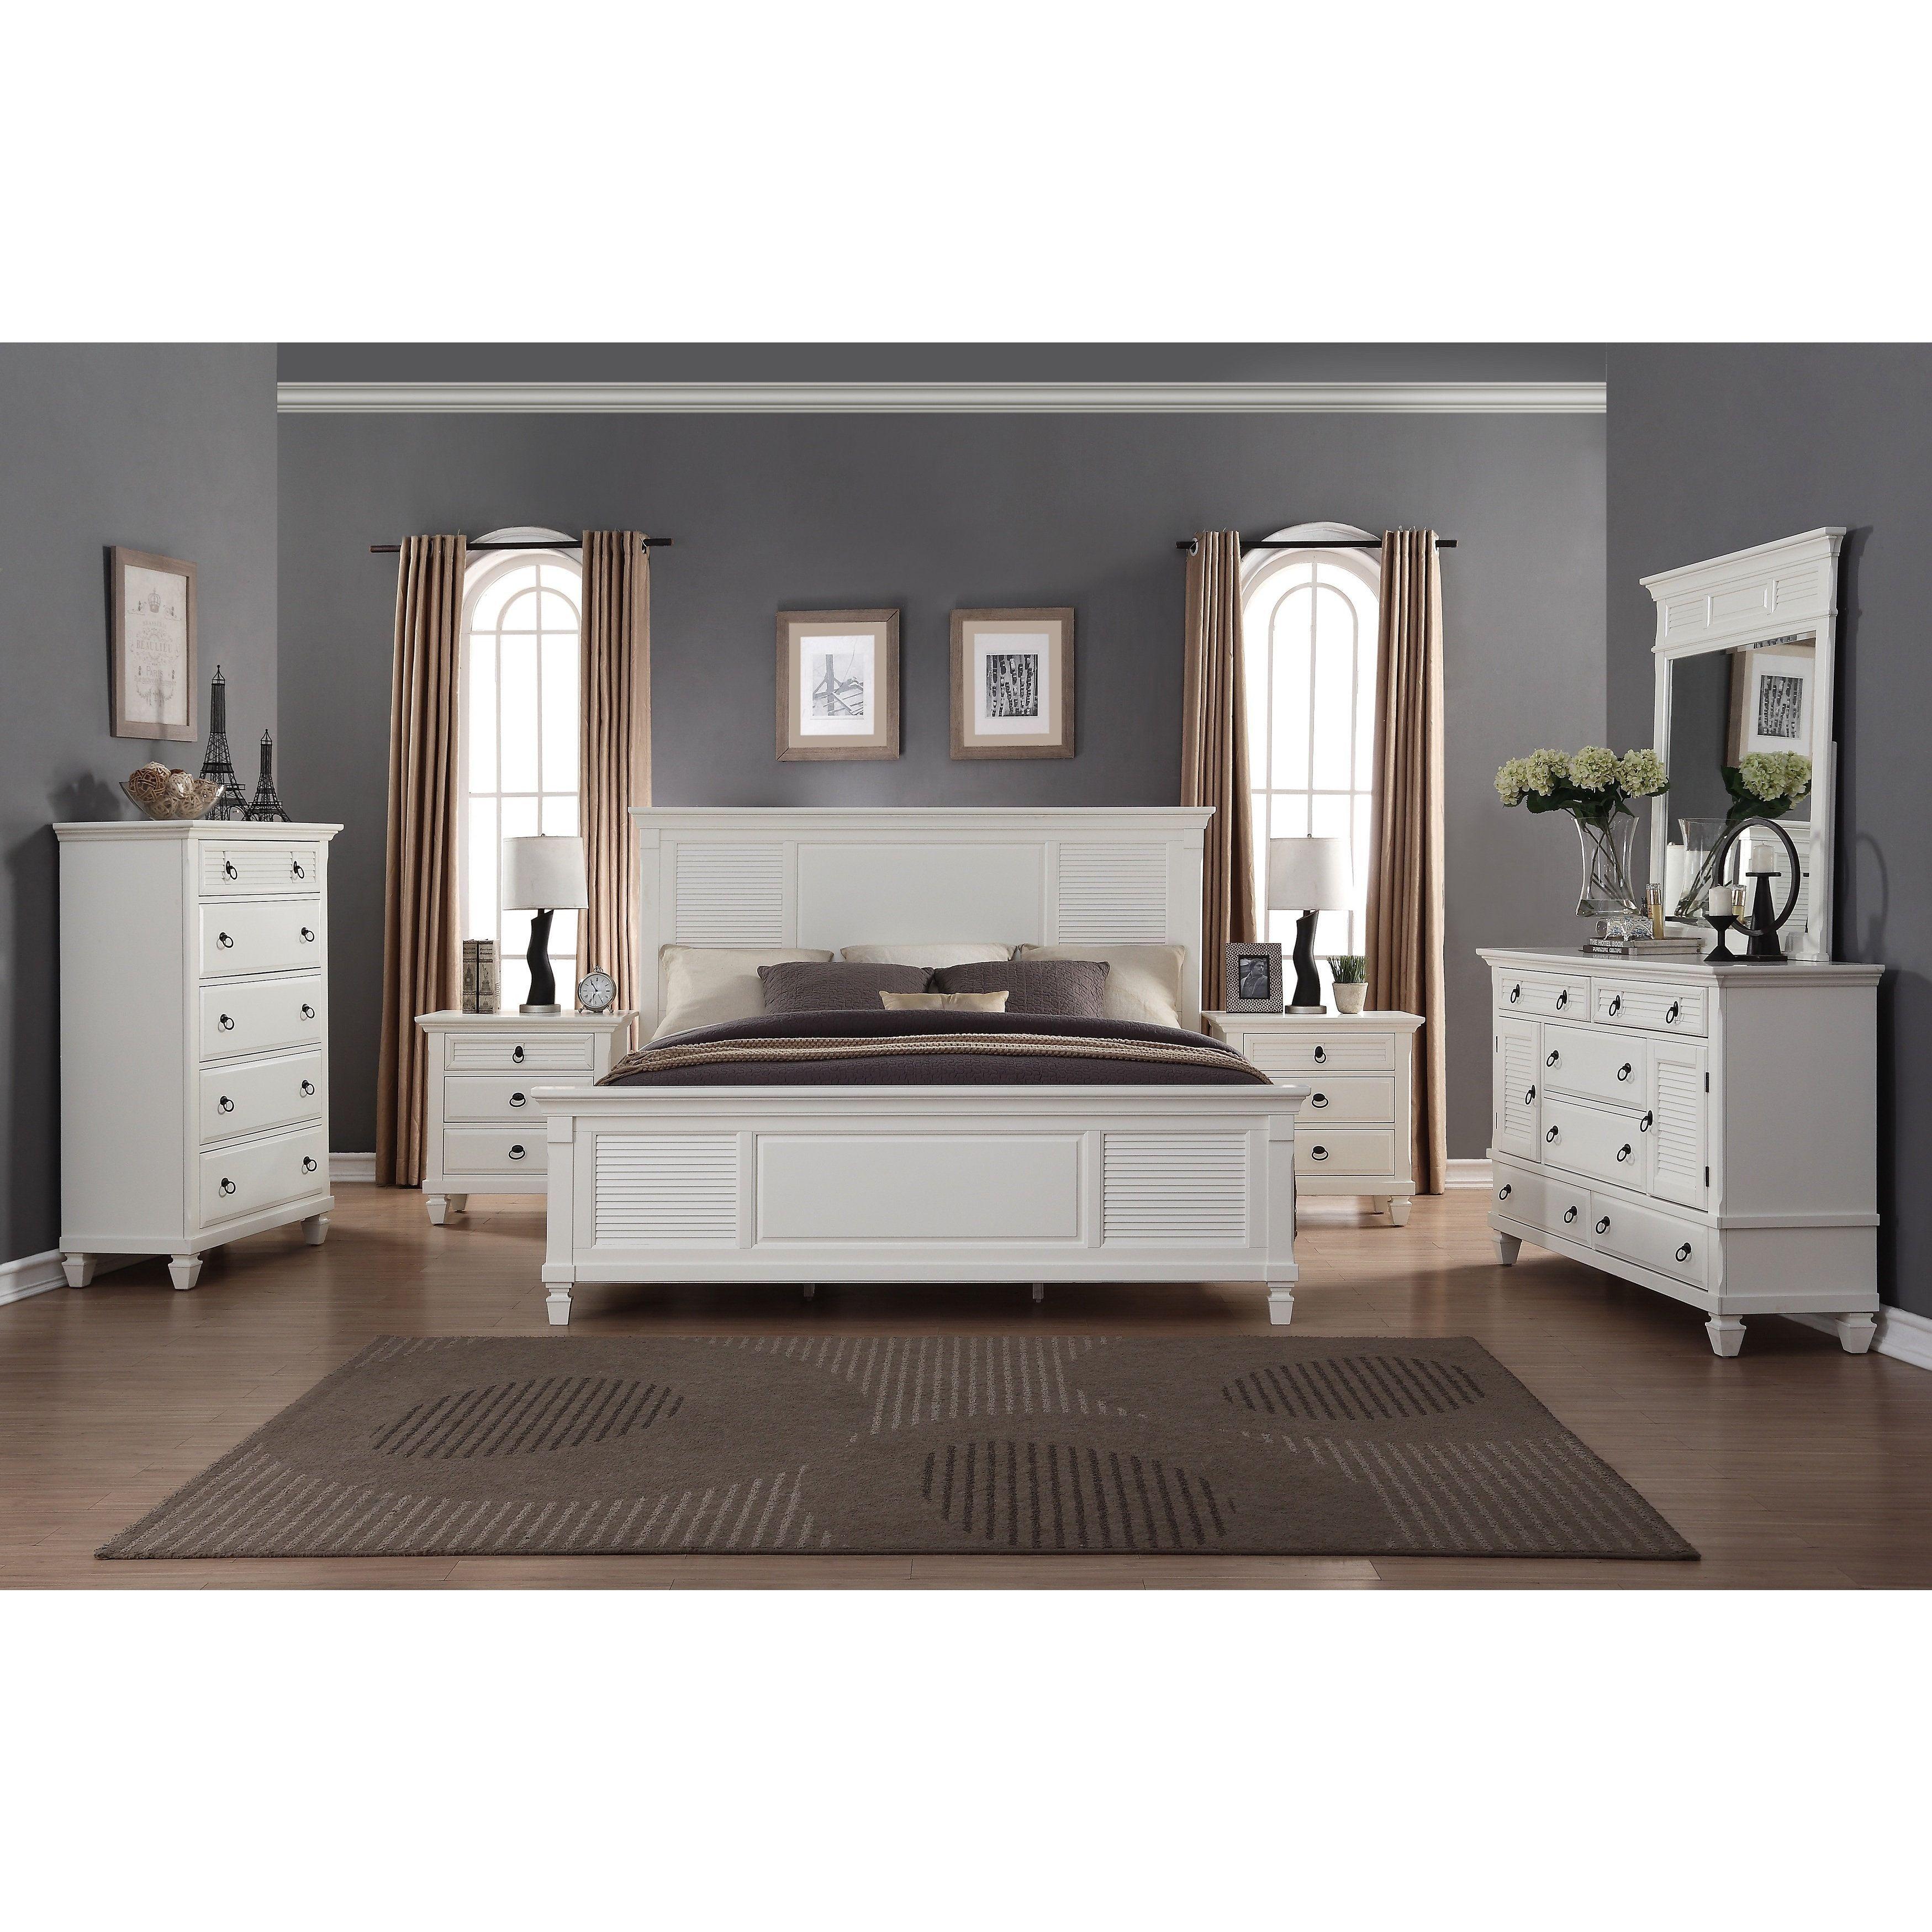 Regitina White 6 Piece King size Bedroom Furniture Set King